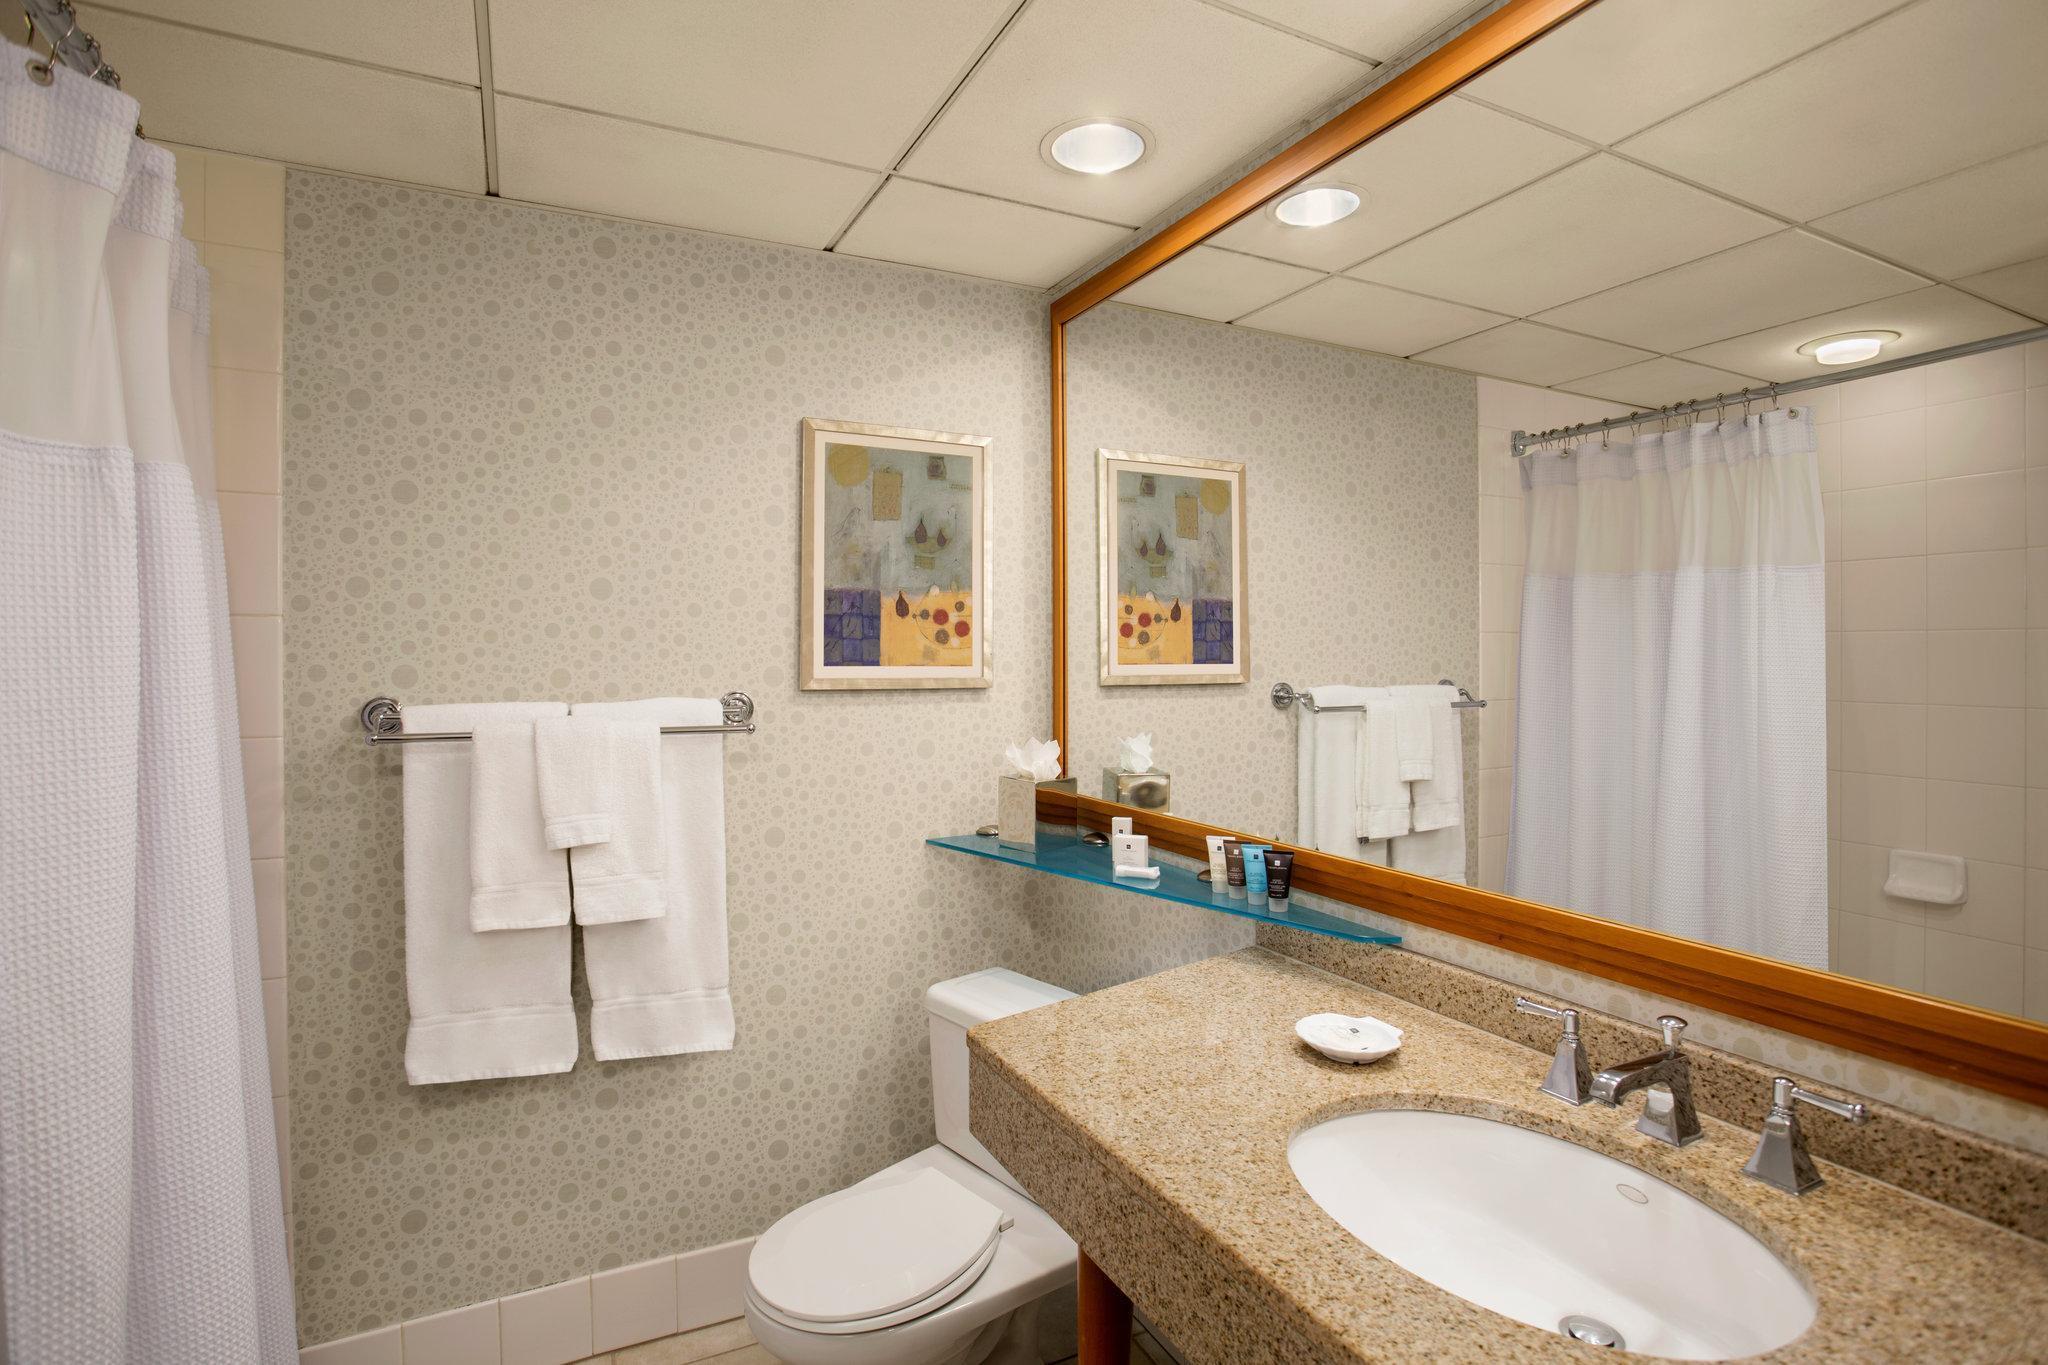 Crowne Plaza San Francisco Airport Hotel San Francisco Ca Deals Photos Reviews